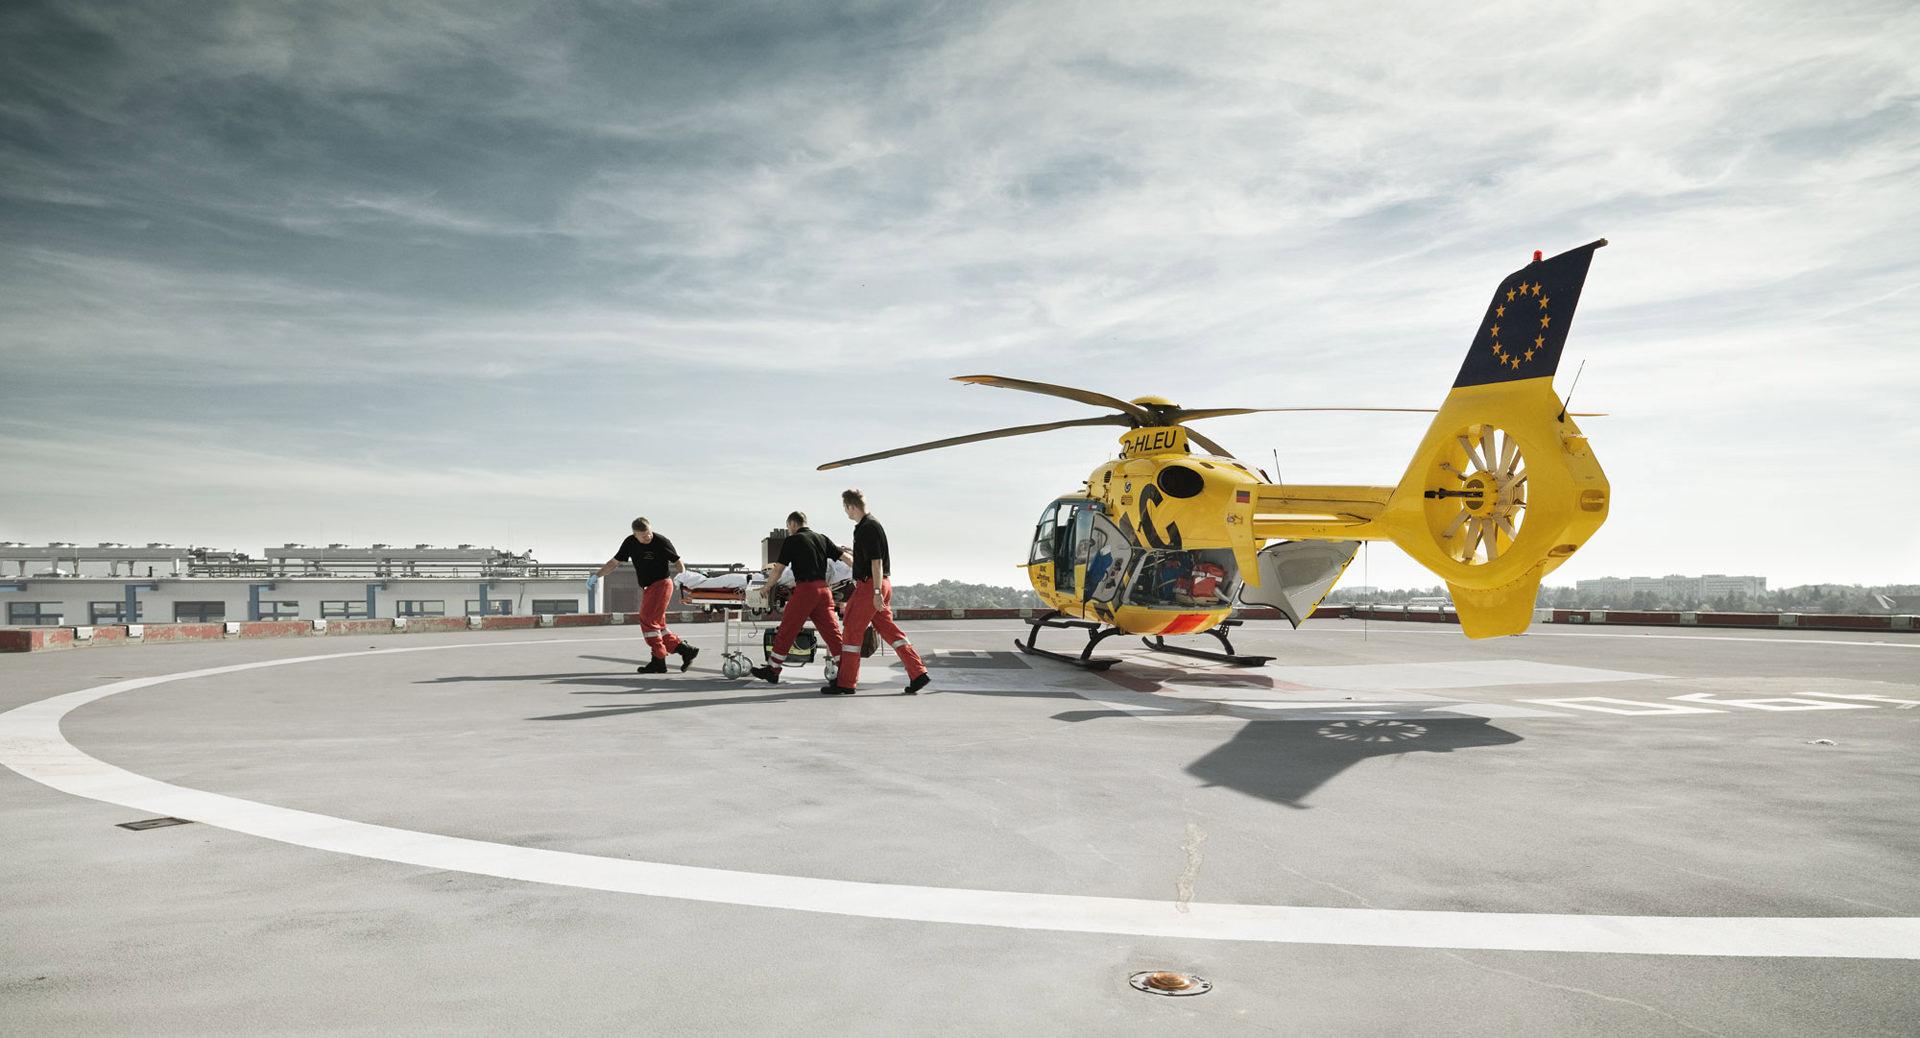 gelbe engel, adac, luftrettung, rescue, helicopter, Germany, anke luckmann, www.ankeluckmann.com, kai tietz, reportage, editorial